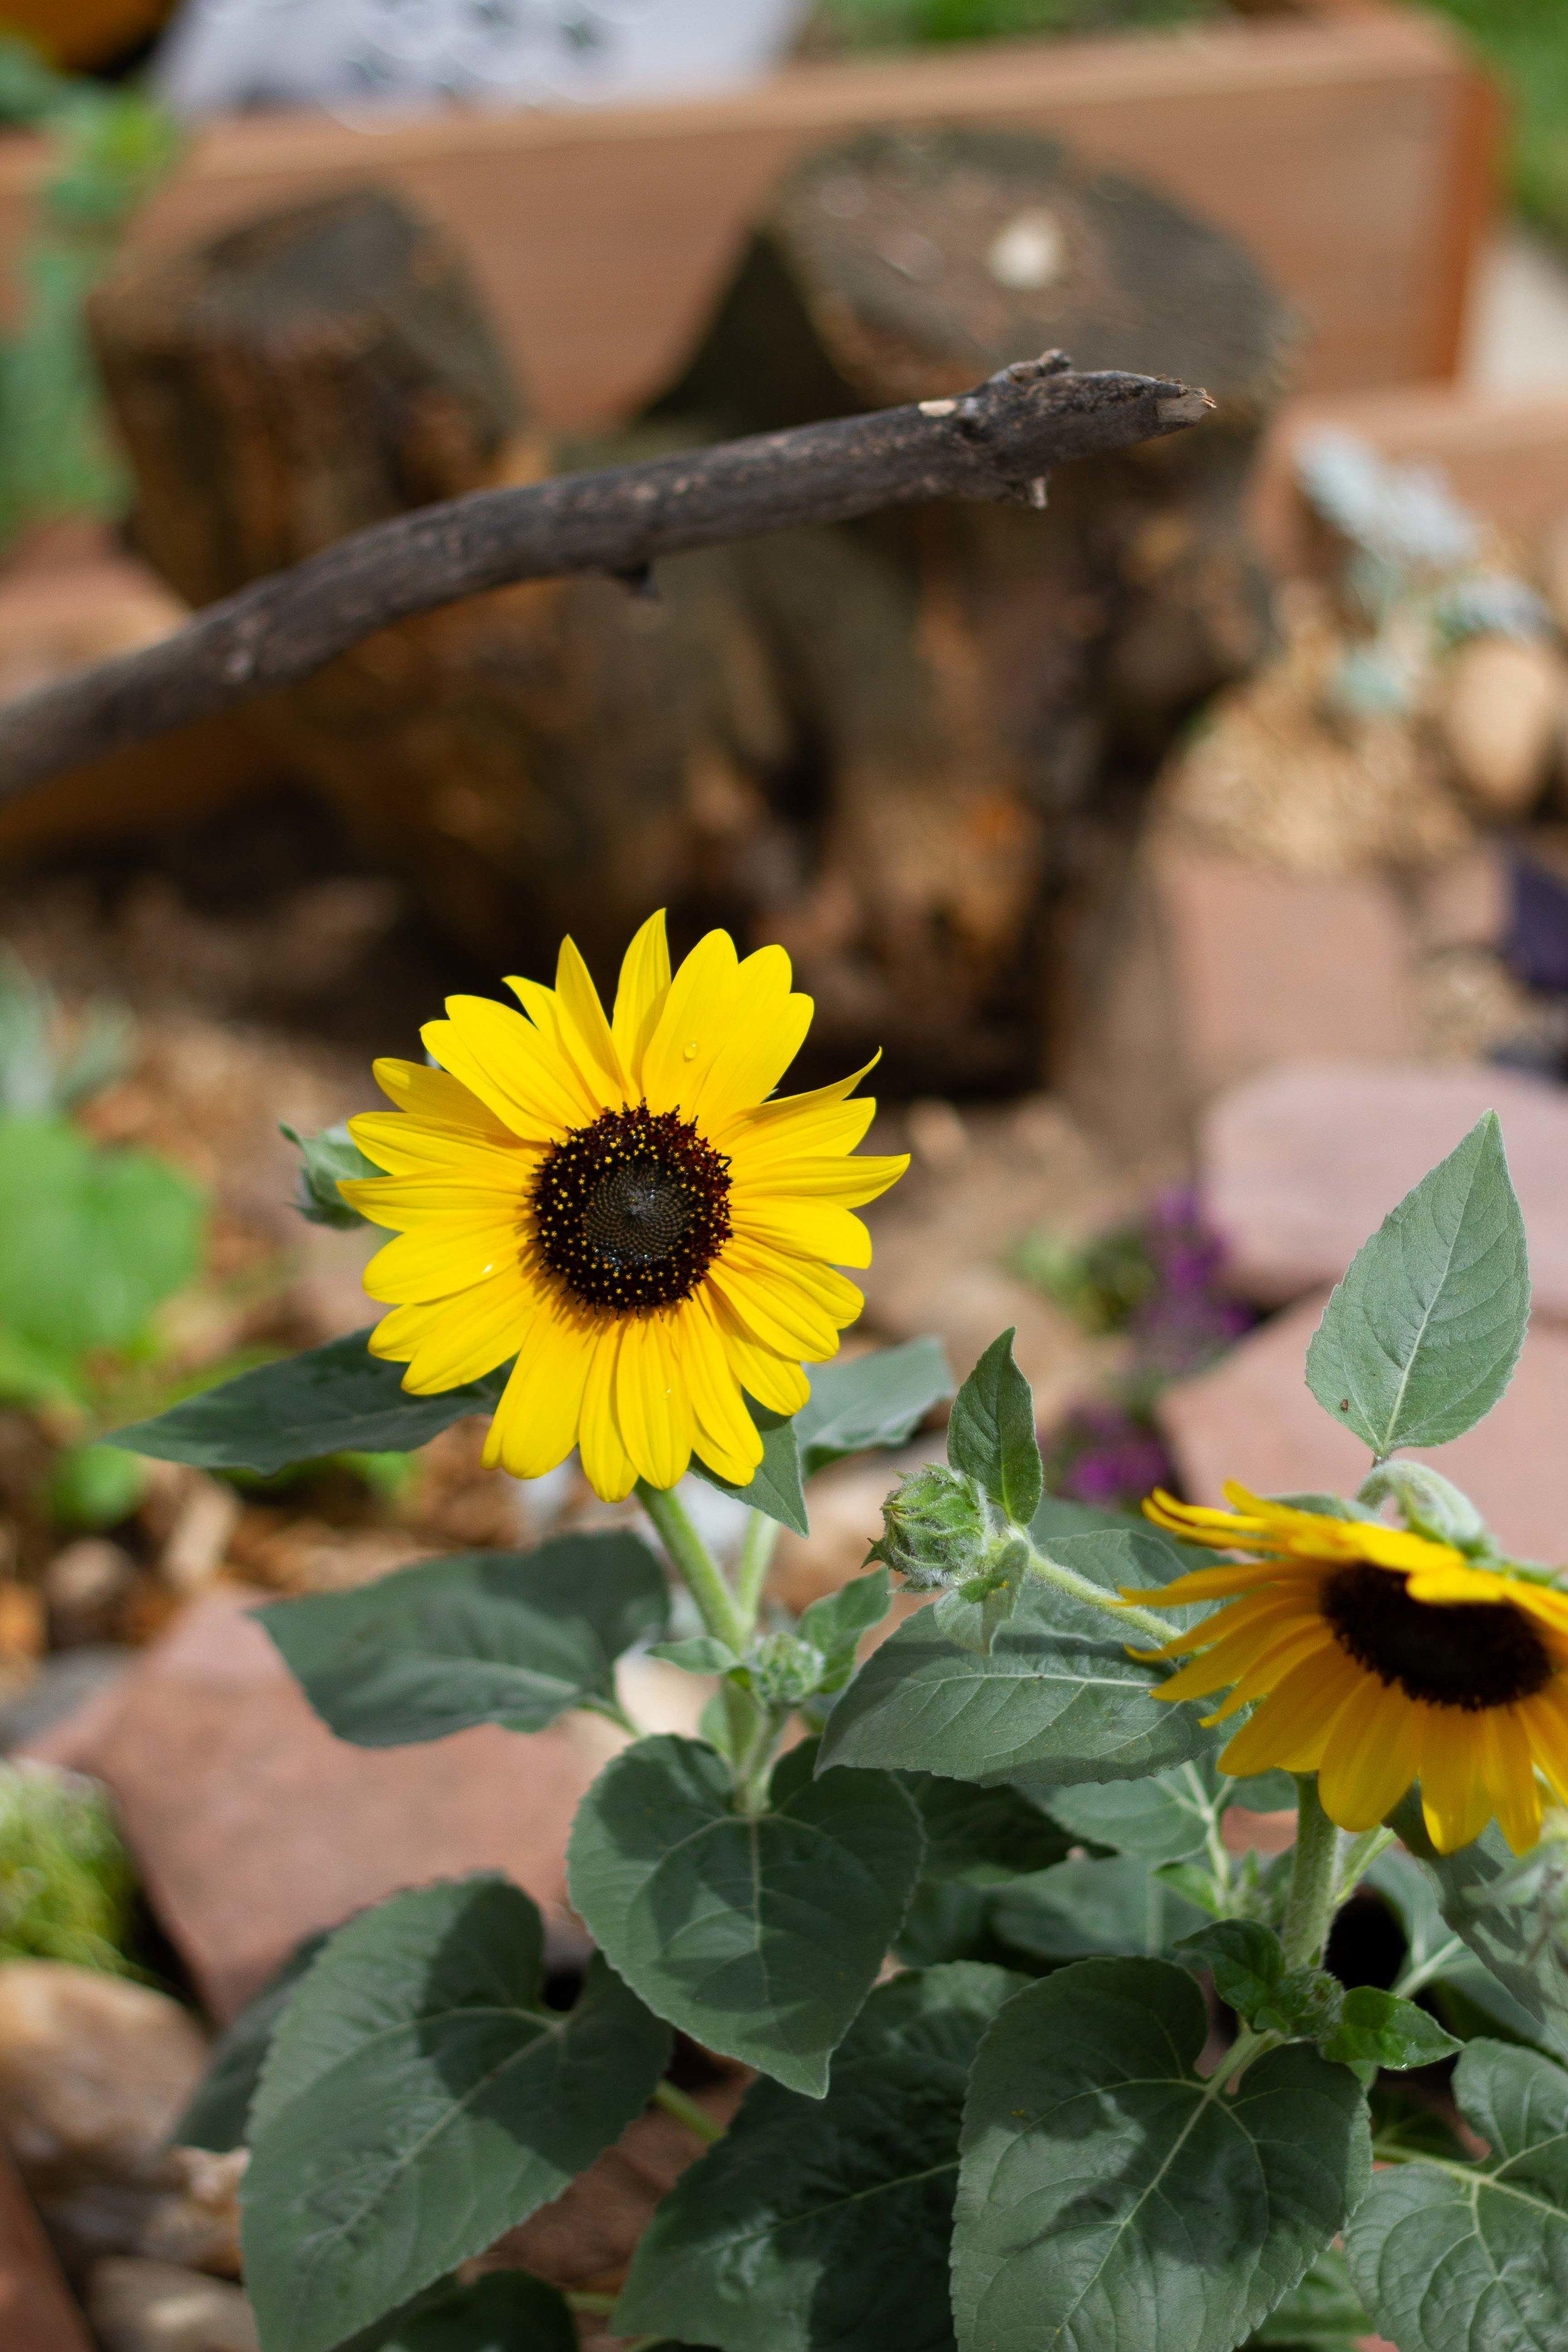 dino garden-5626.jpg